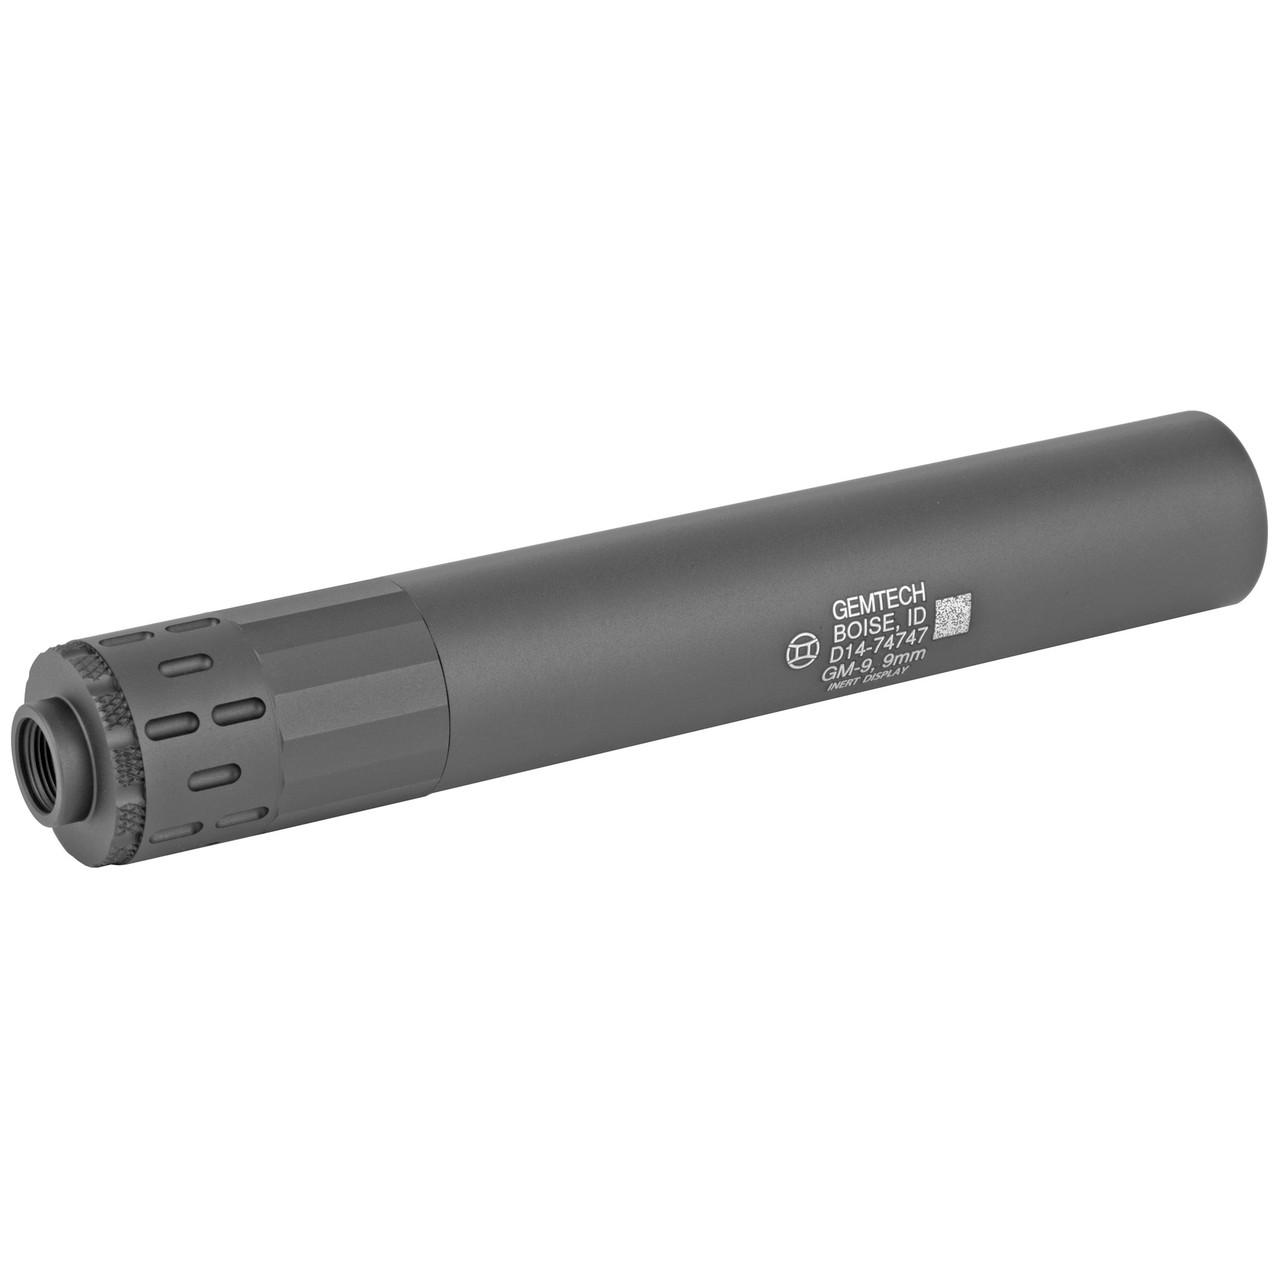 Gemtech GM-9, Display Suppressor, 9MM, Black, 1/2 X 28 TPI, Black Finish 12247